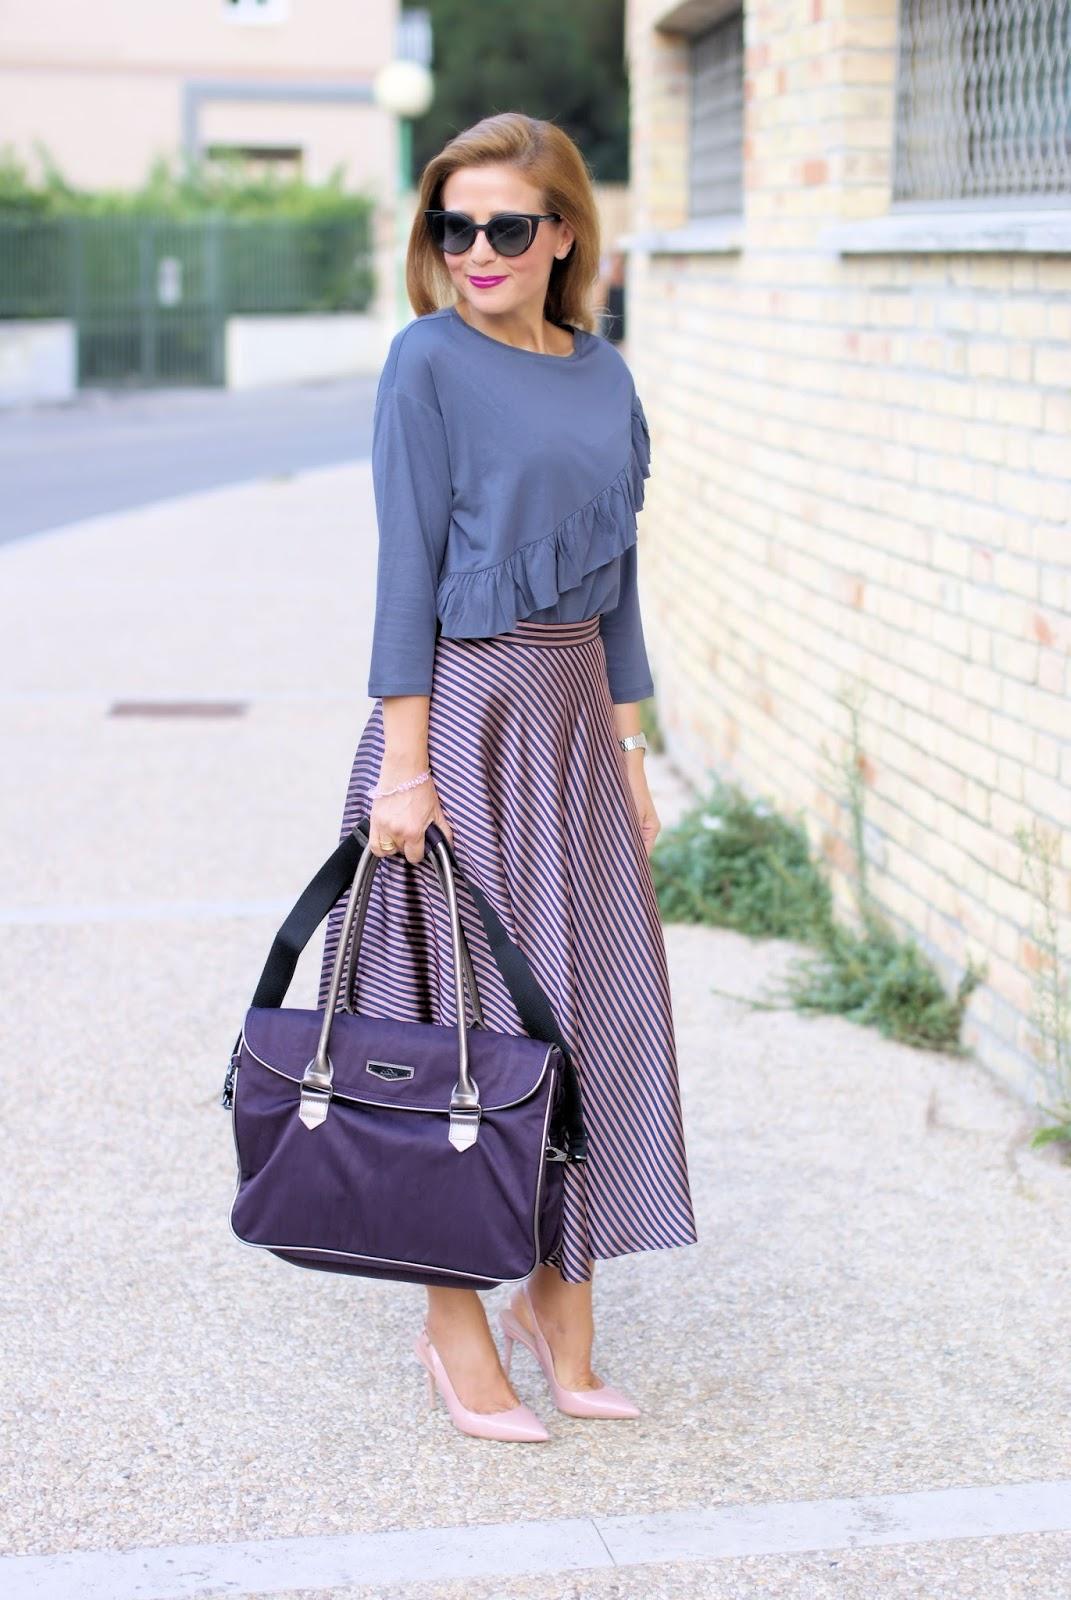 Superwork Kipling bag on Fashion and Cookies fashion blog, fashion blogger style